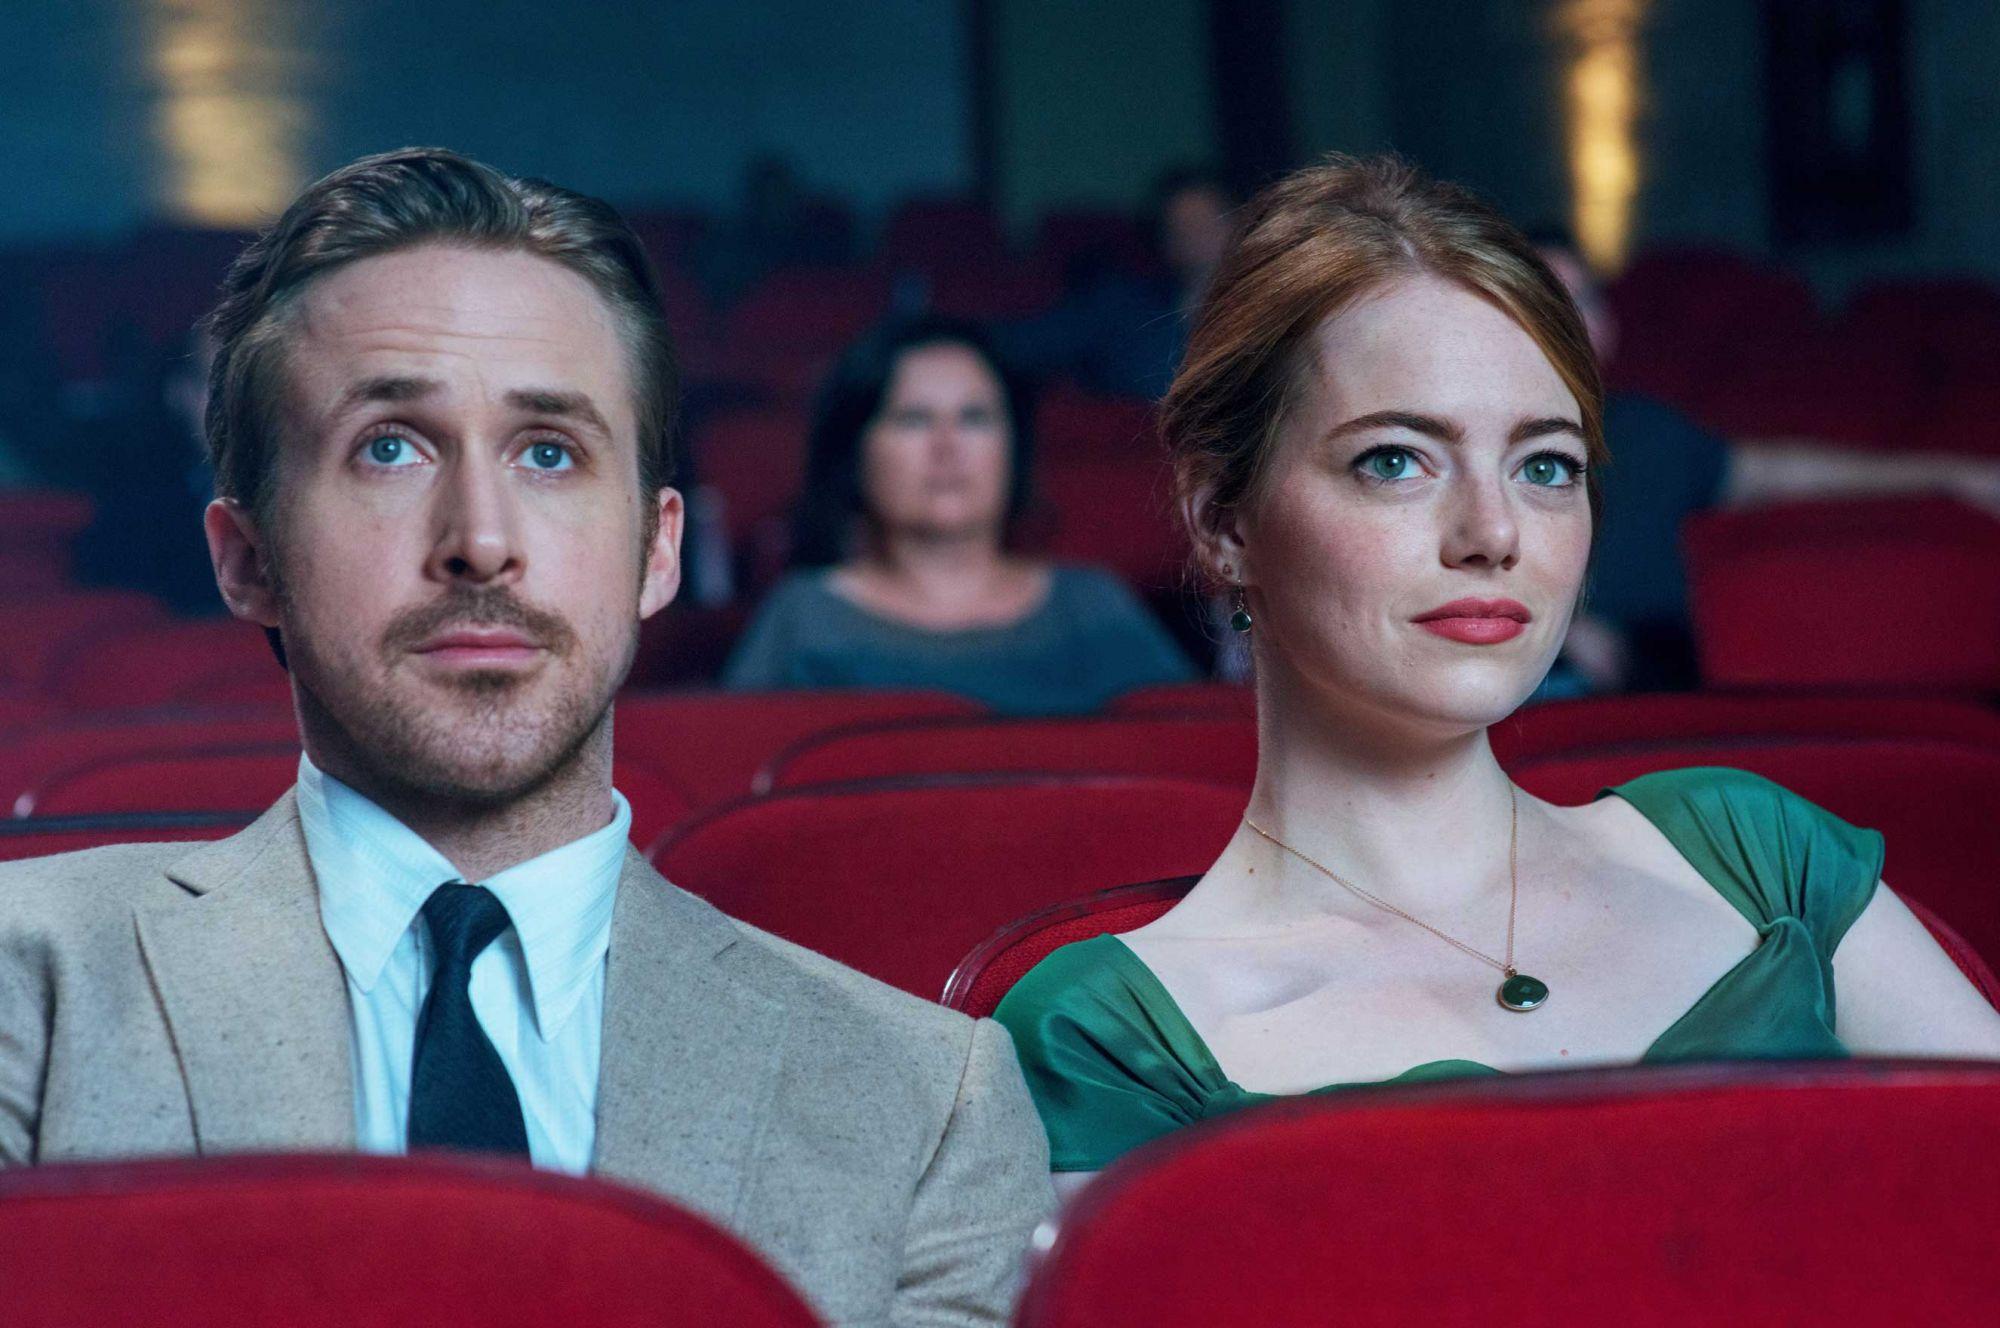 Ryan Gosling and Emma Stone in La La Land | Photo: SPIN